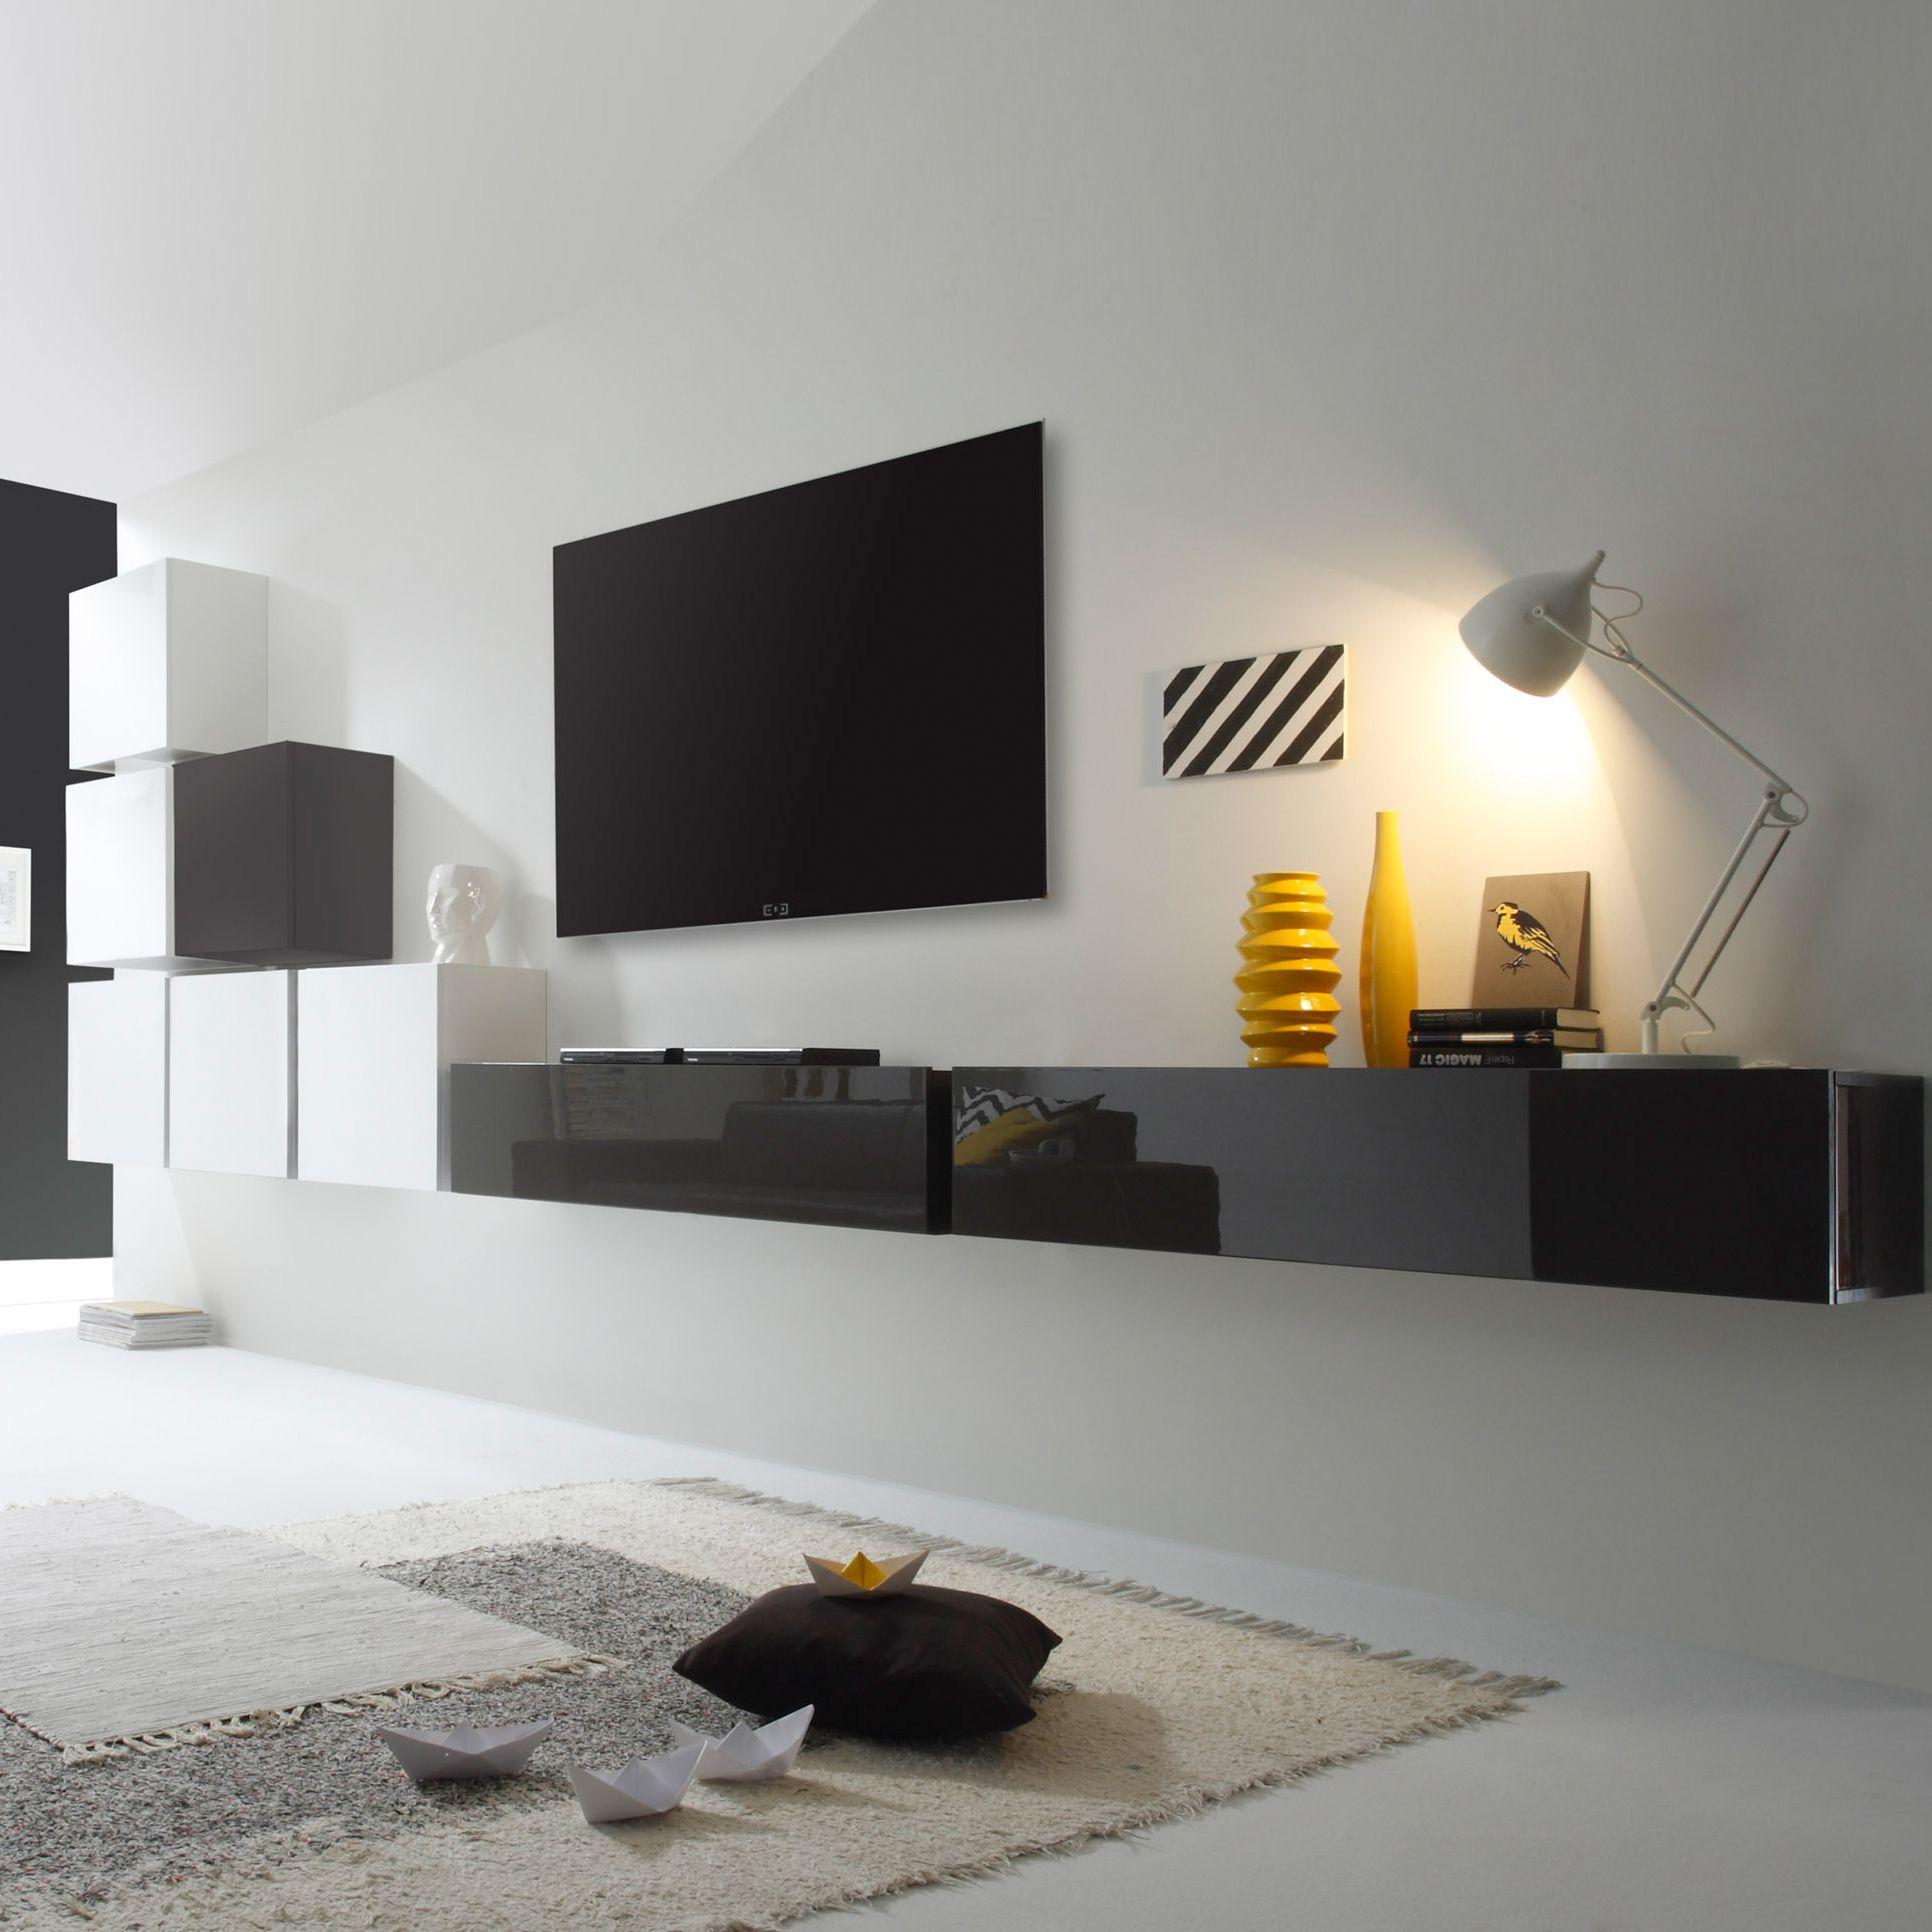 Die moderne wohnwand serie cube steht f r for Moderne wohnwand